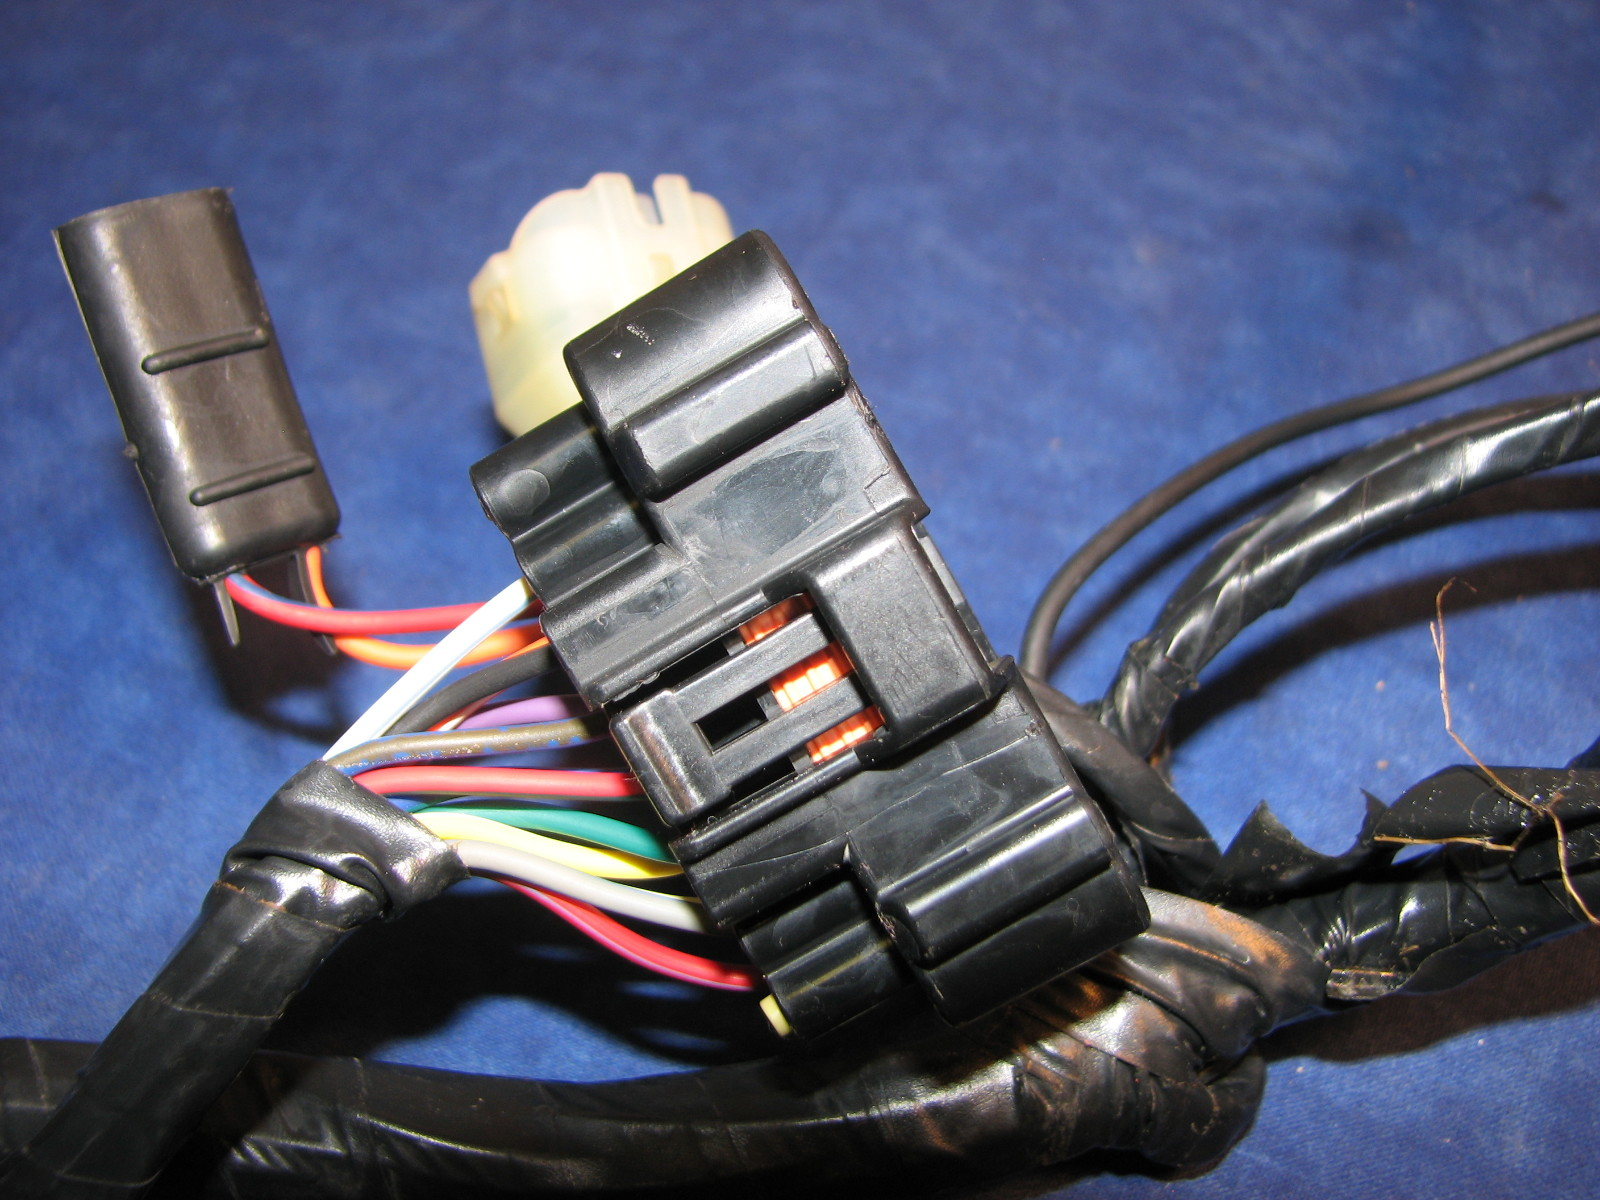 Arctic Cat Wiring Harness 2005 400 4x4 Vp Auto 0486